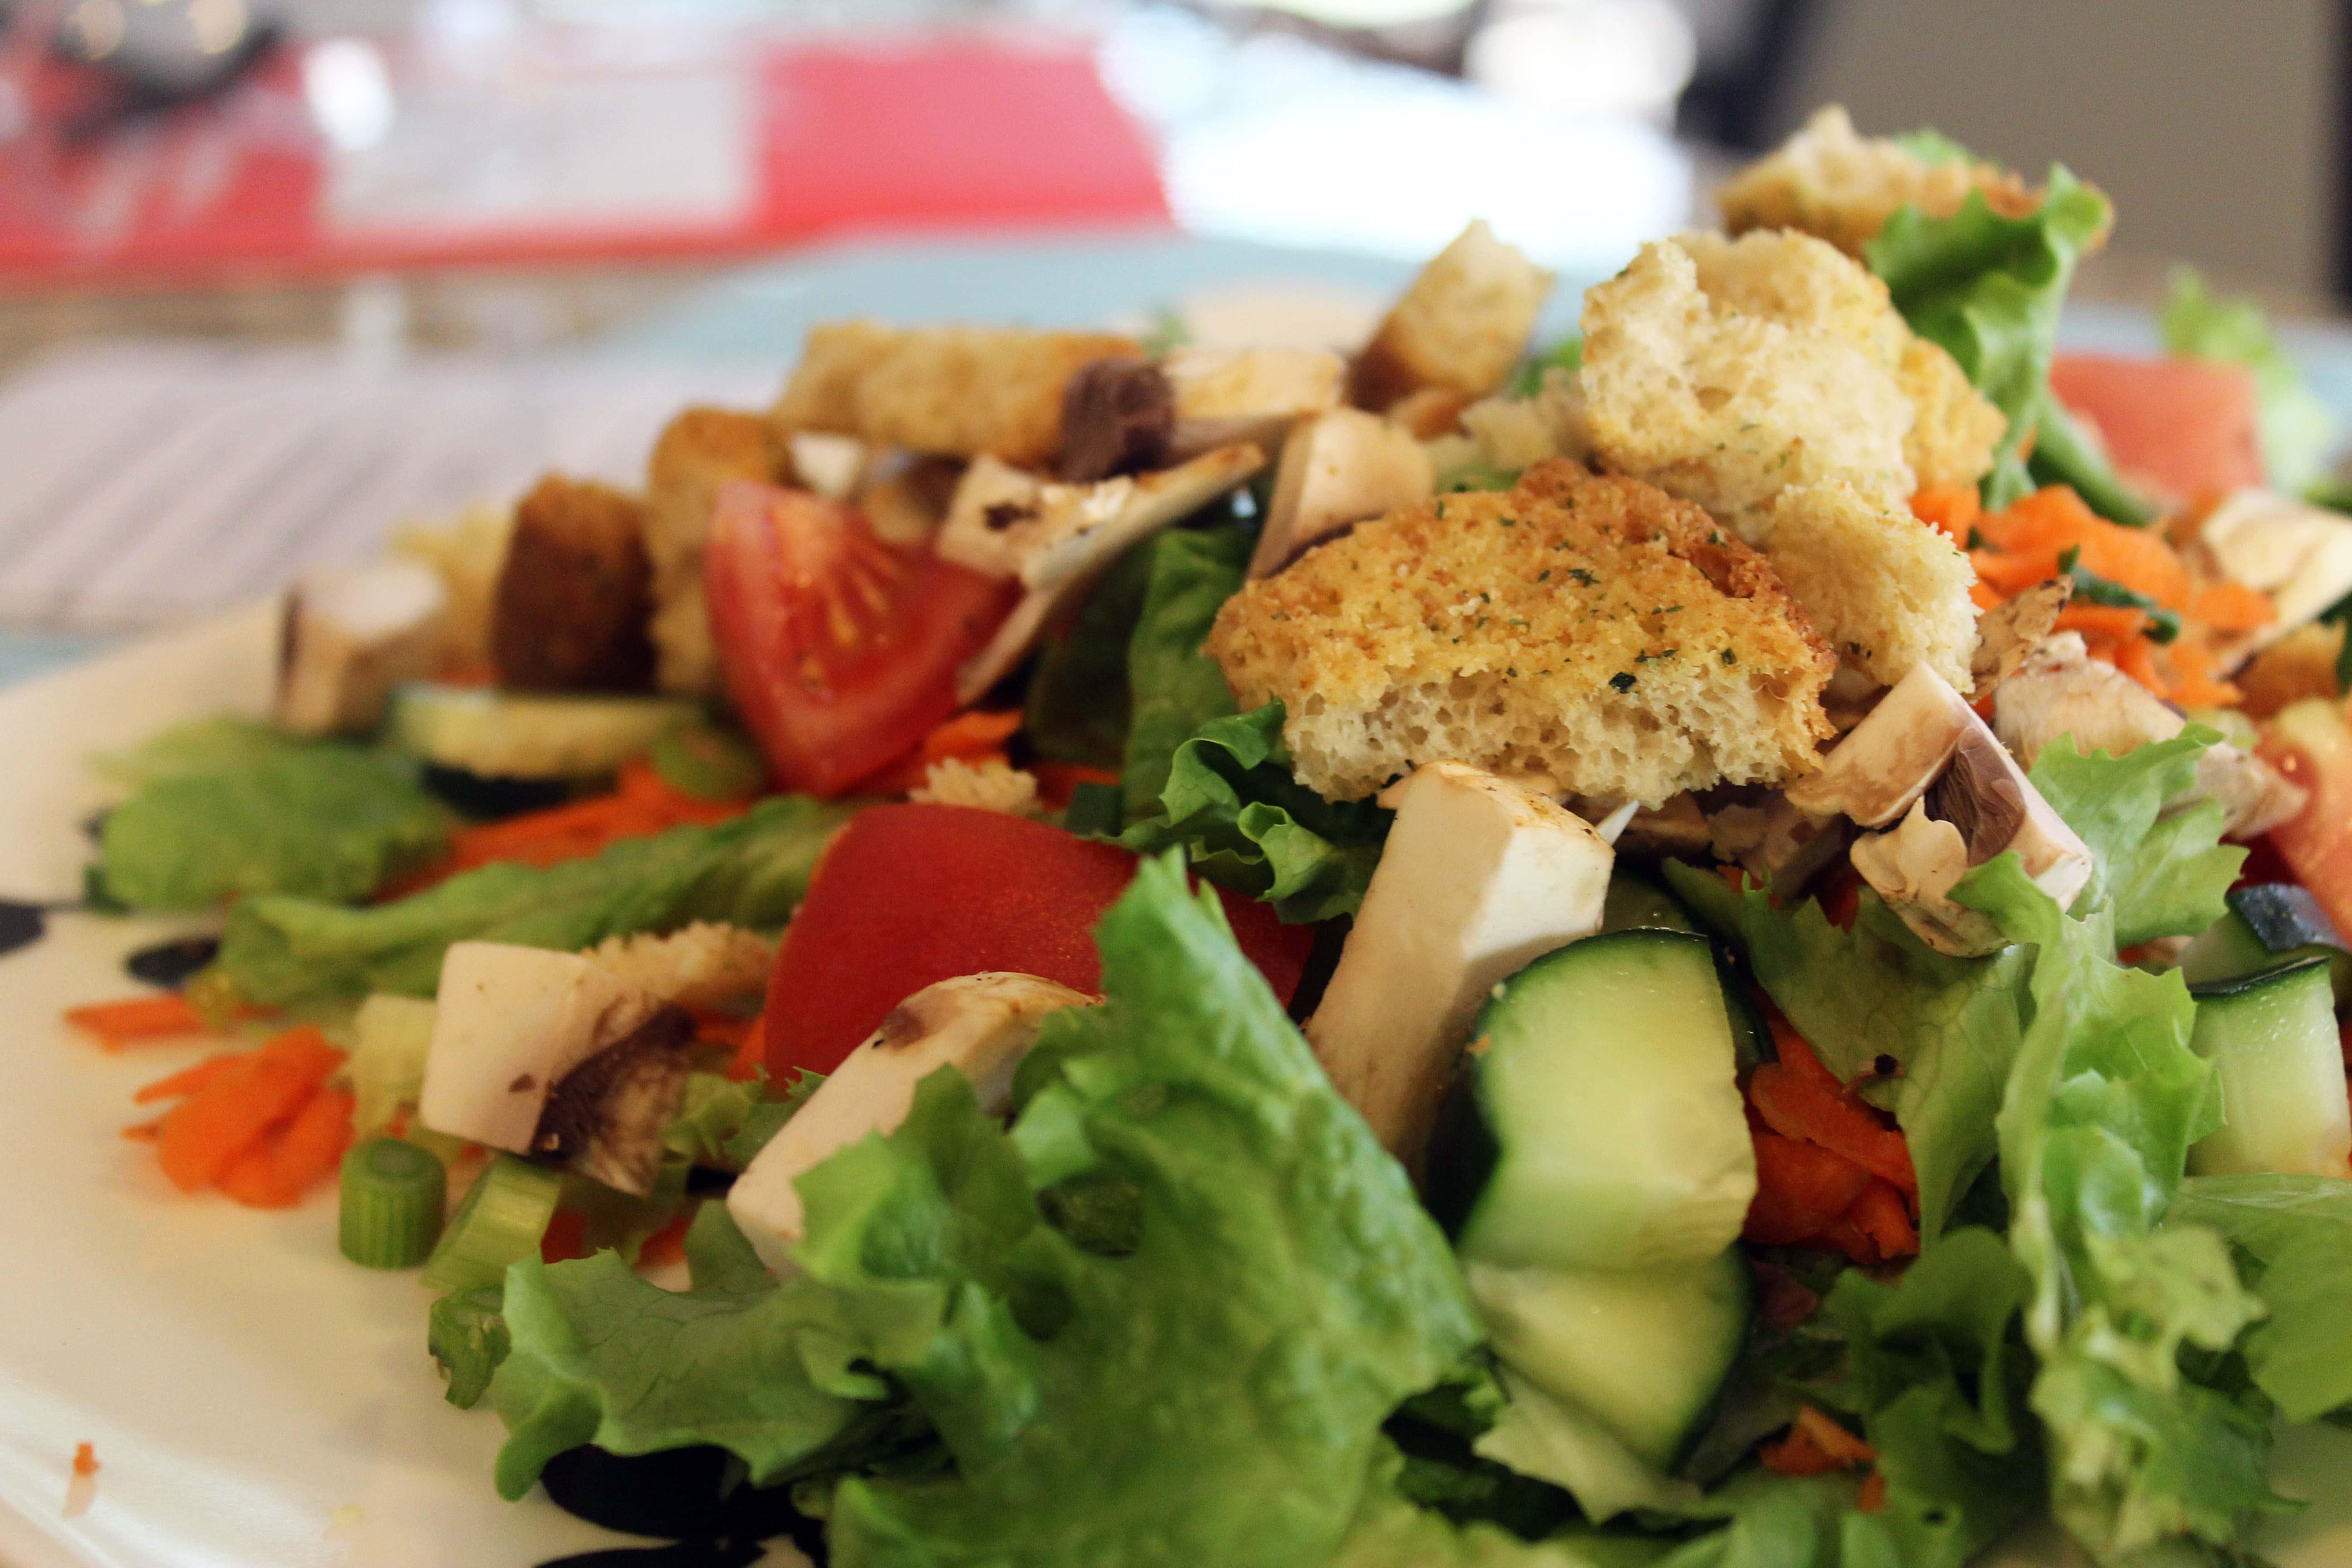 Prep salads with veggies